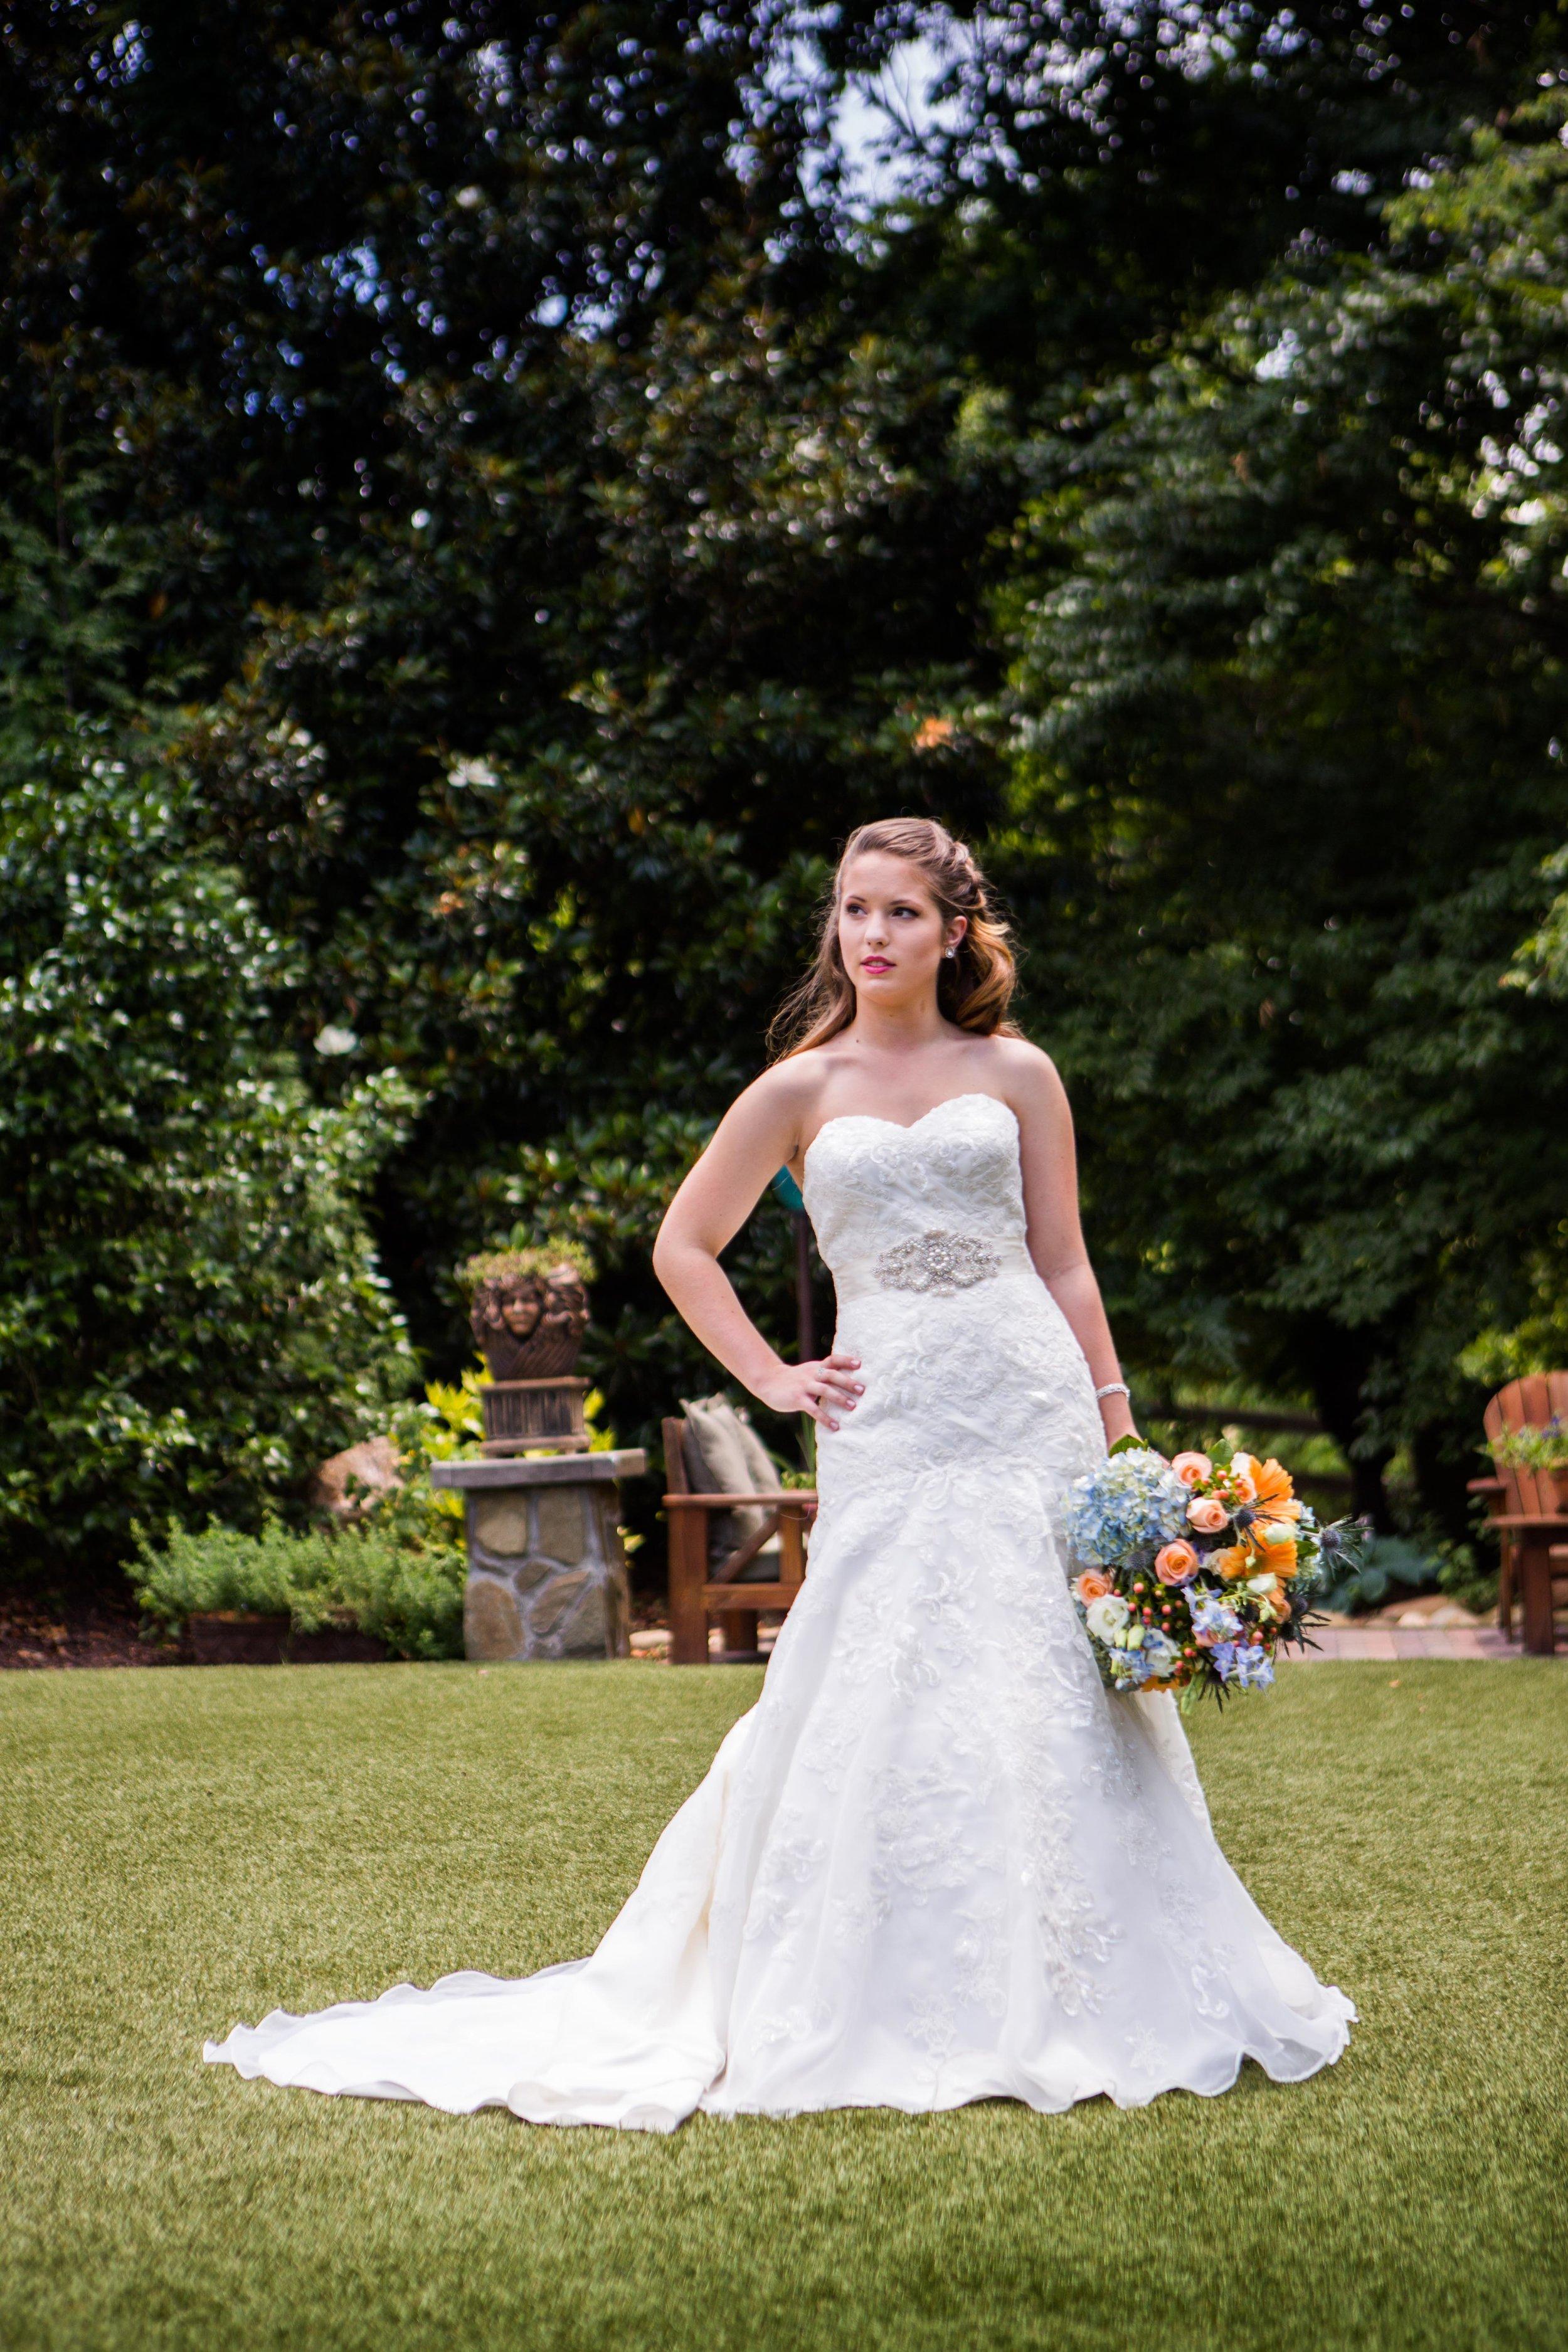 060416_Norris_Smith_Wedding_CF_1652.jpg